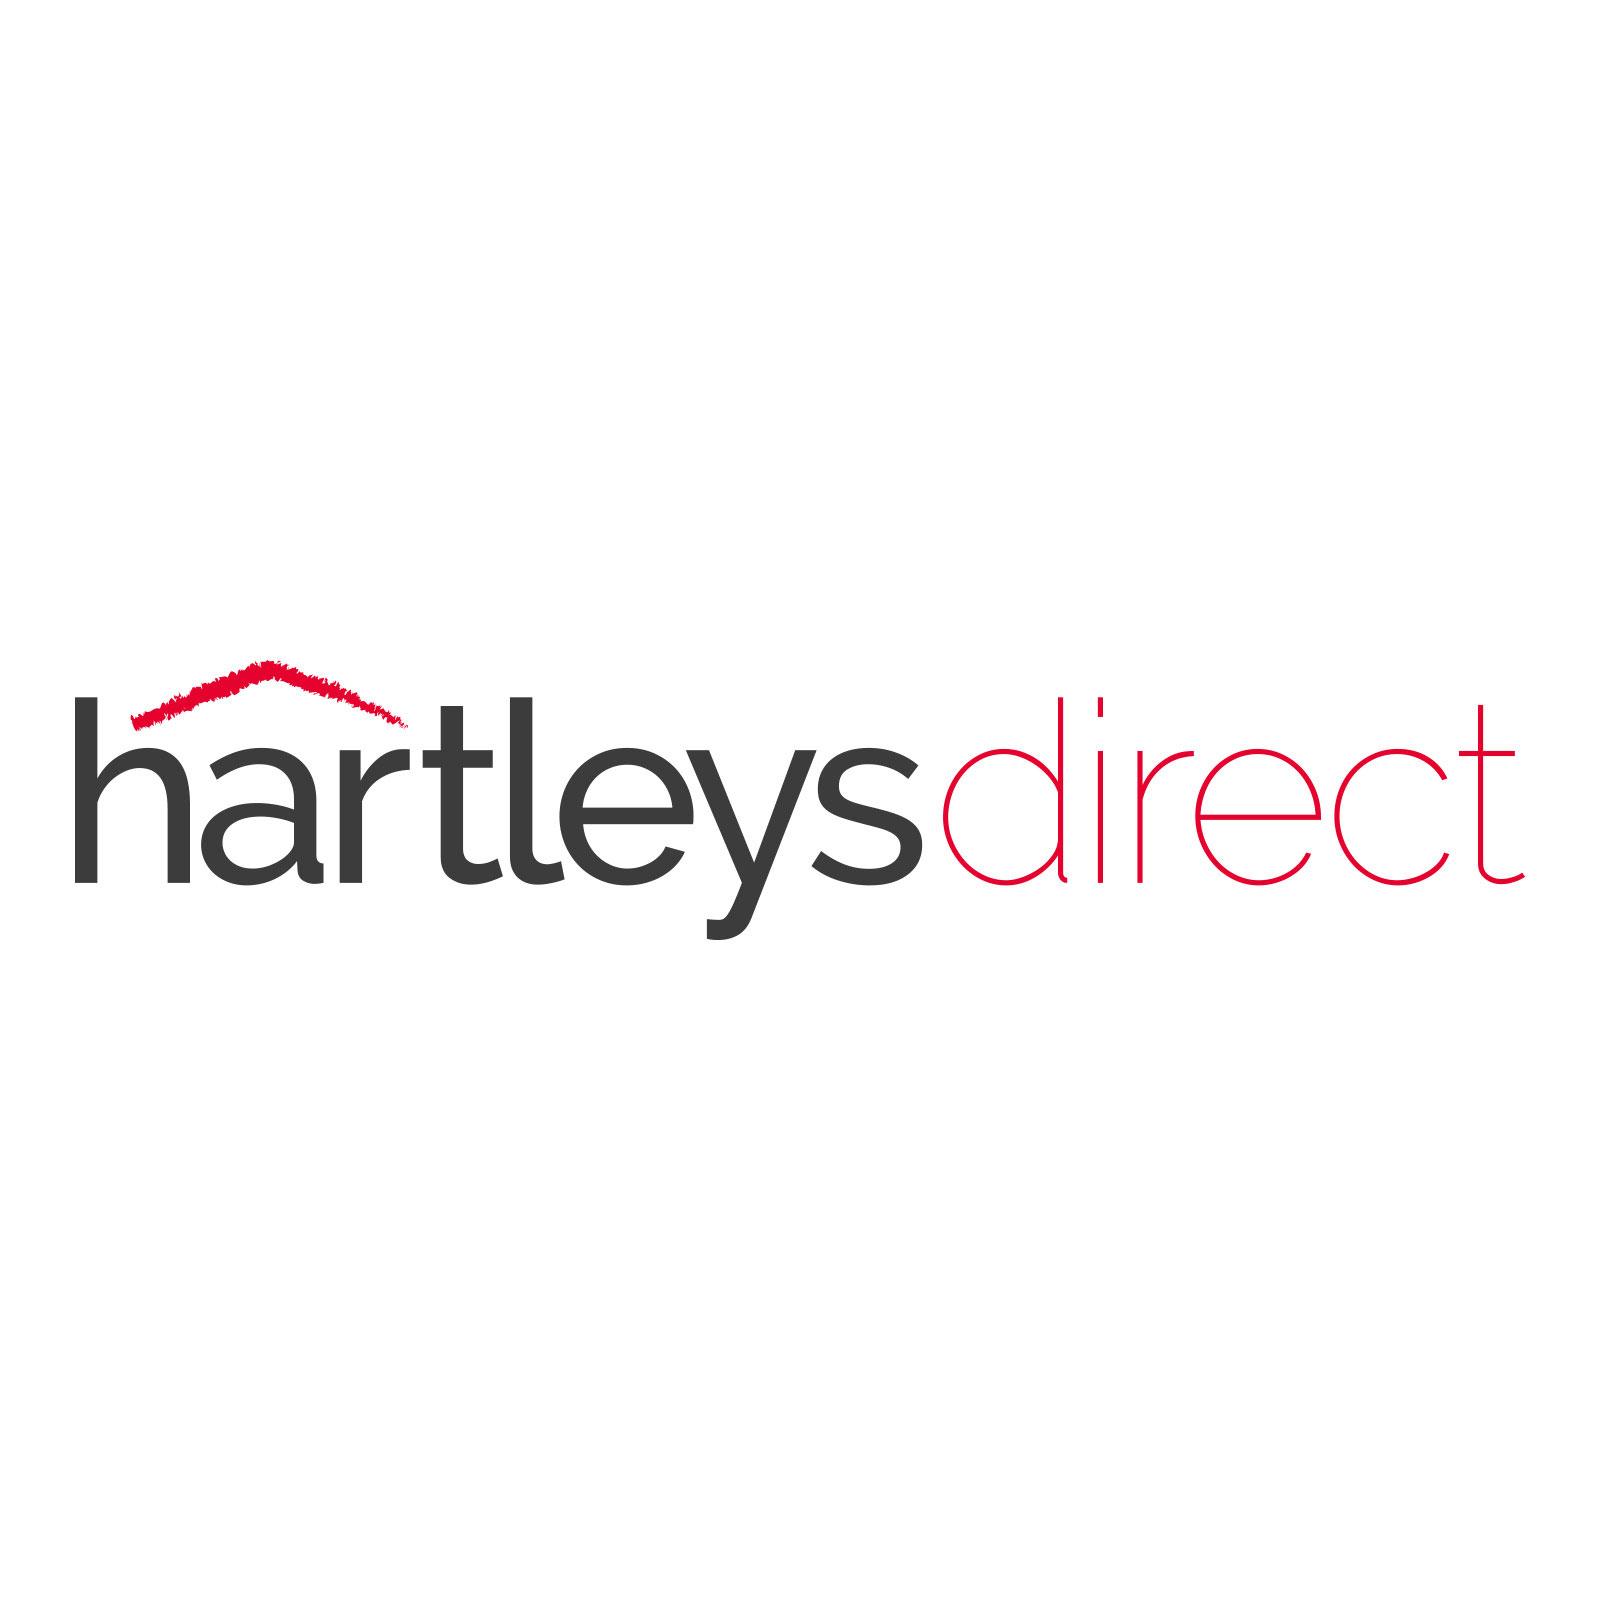 Hartleys-3-Drawer-Grey-Retro-Bedside-Table-on-White-Background.jpg